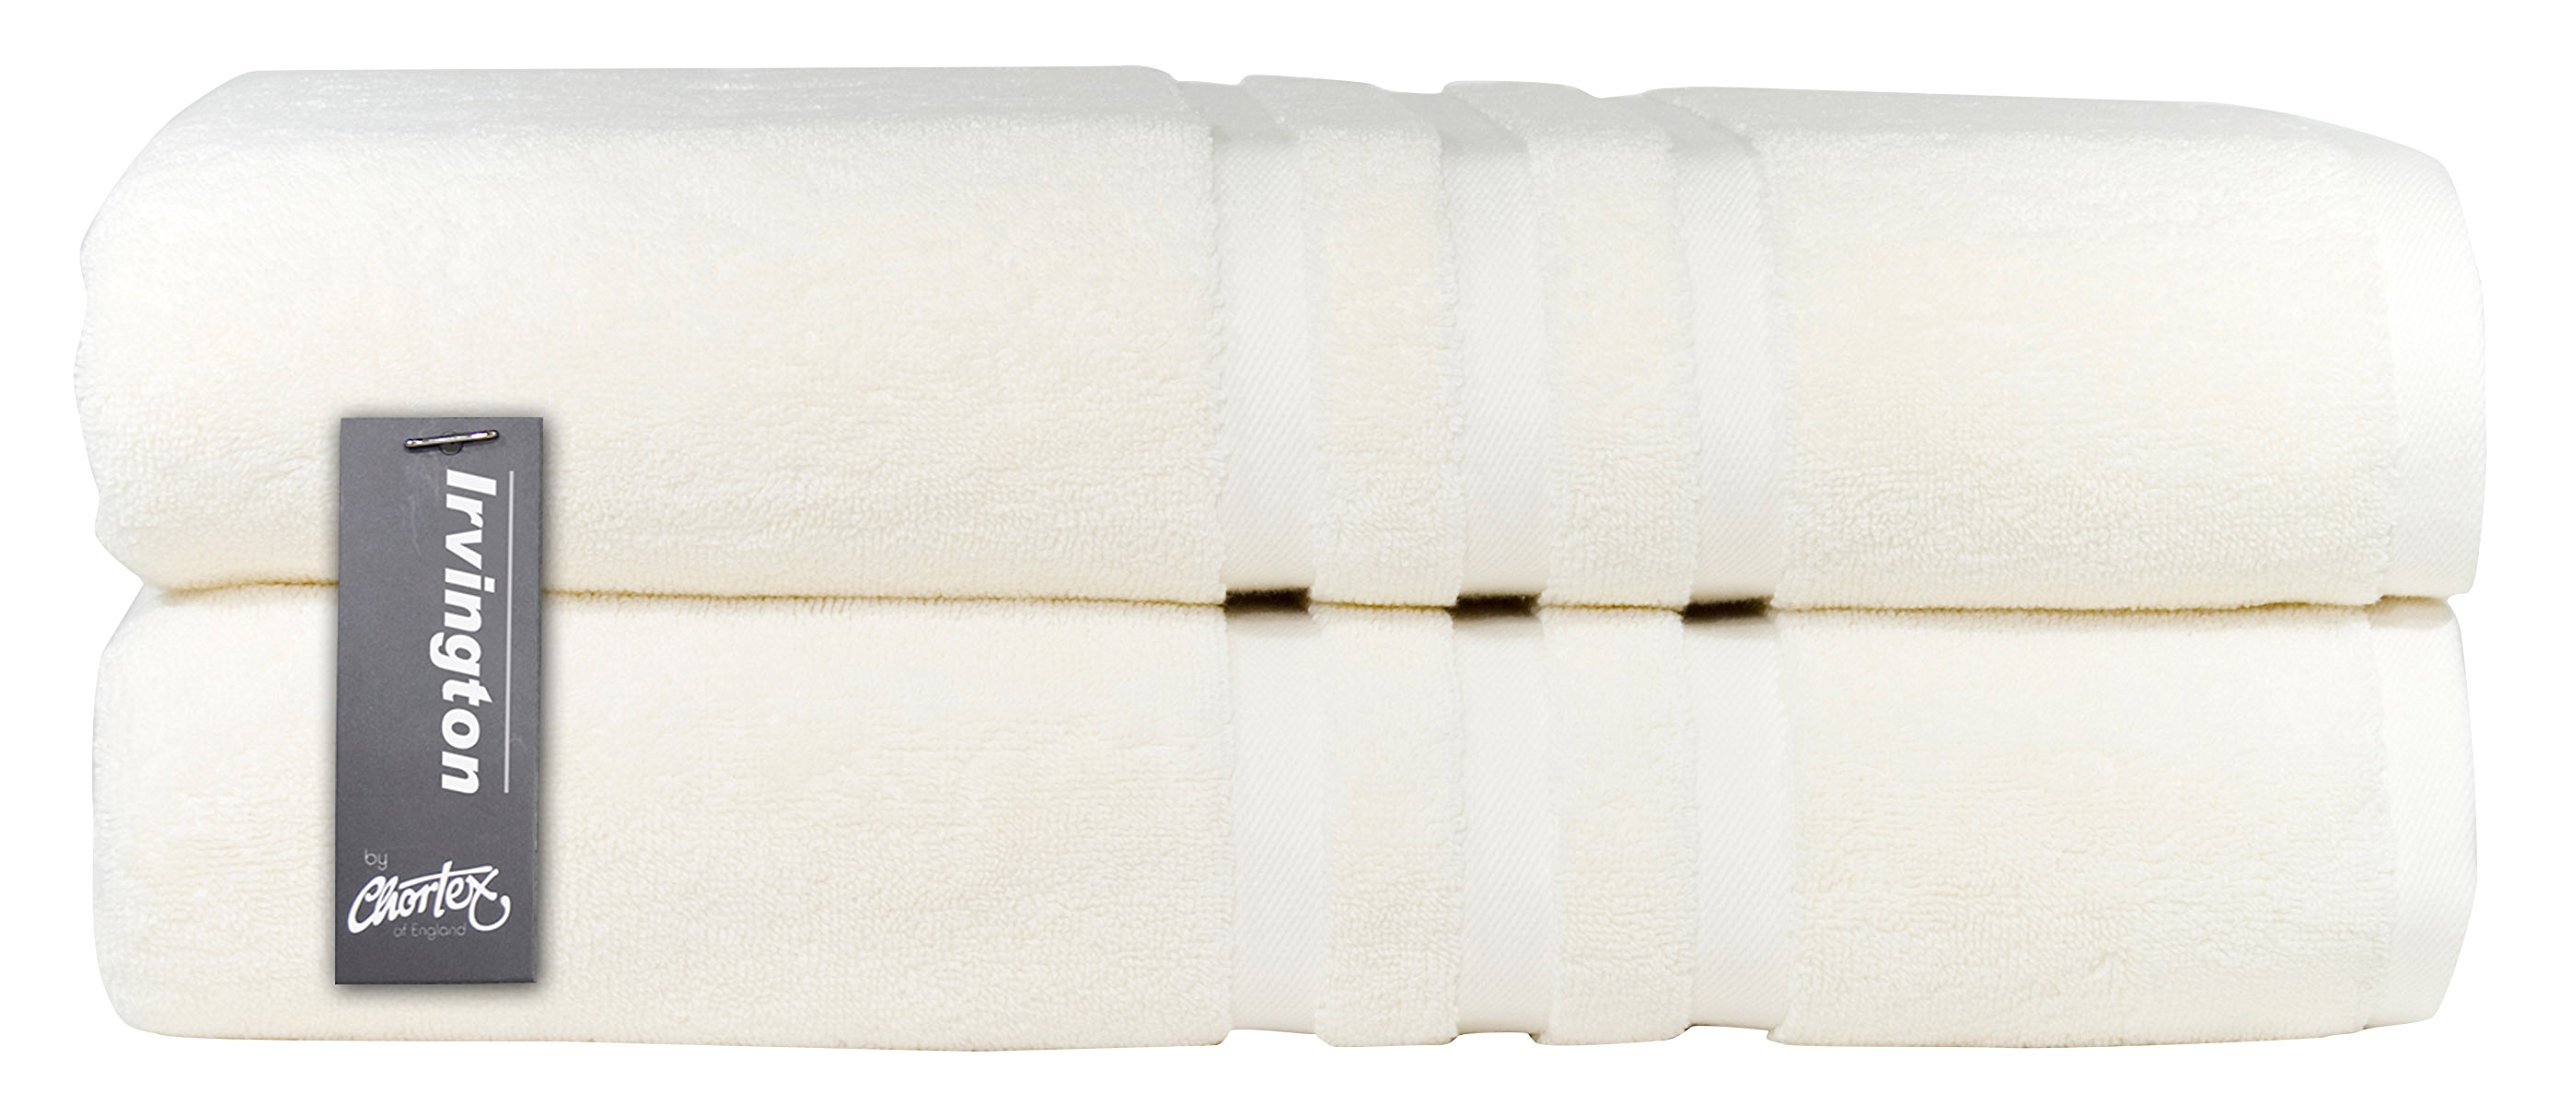 Chortex Luxury Turkish Cotton Bath Sheet (2 Pack), Pack of 2, Cream by Chortex (Image #1)